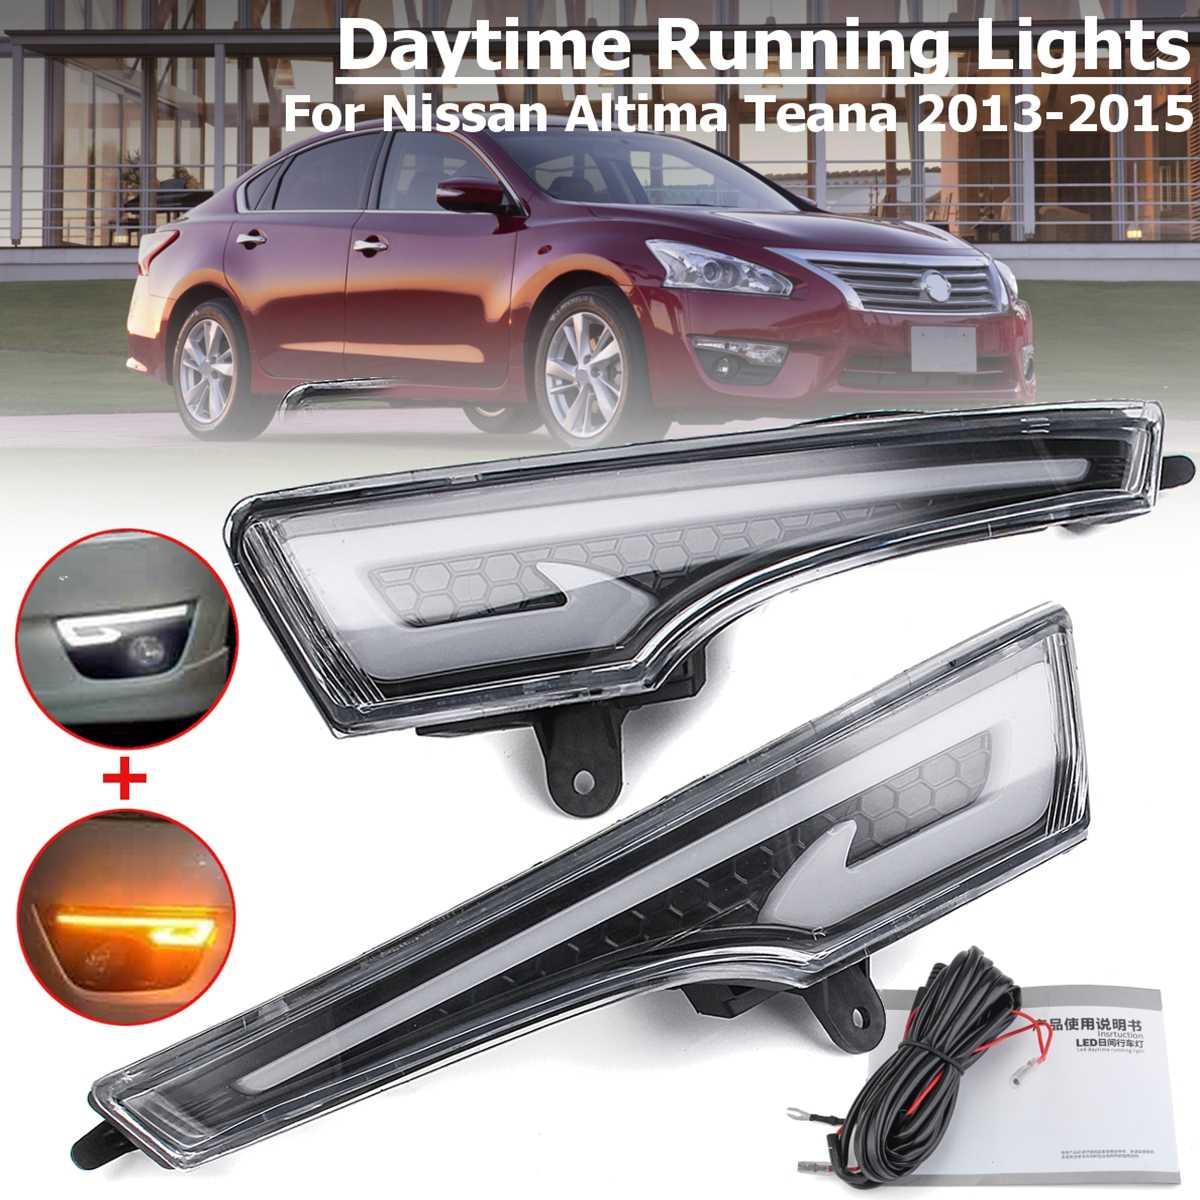 LED DRL For Nissan Altima Teana 2013-2015 Daytime Running Lights w// Turn Signal